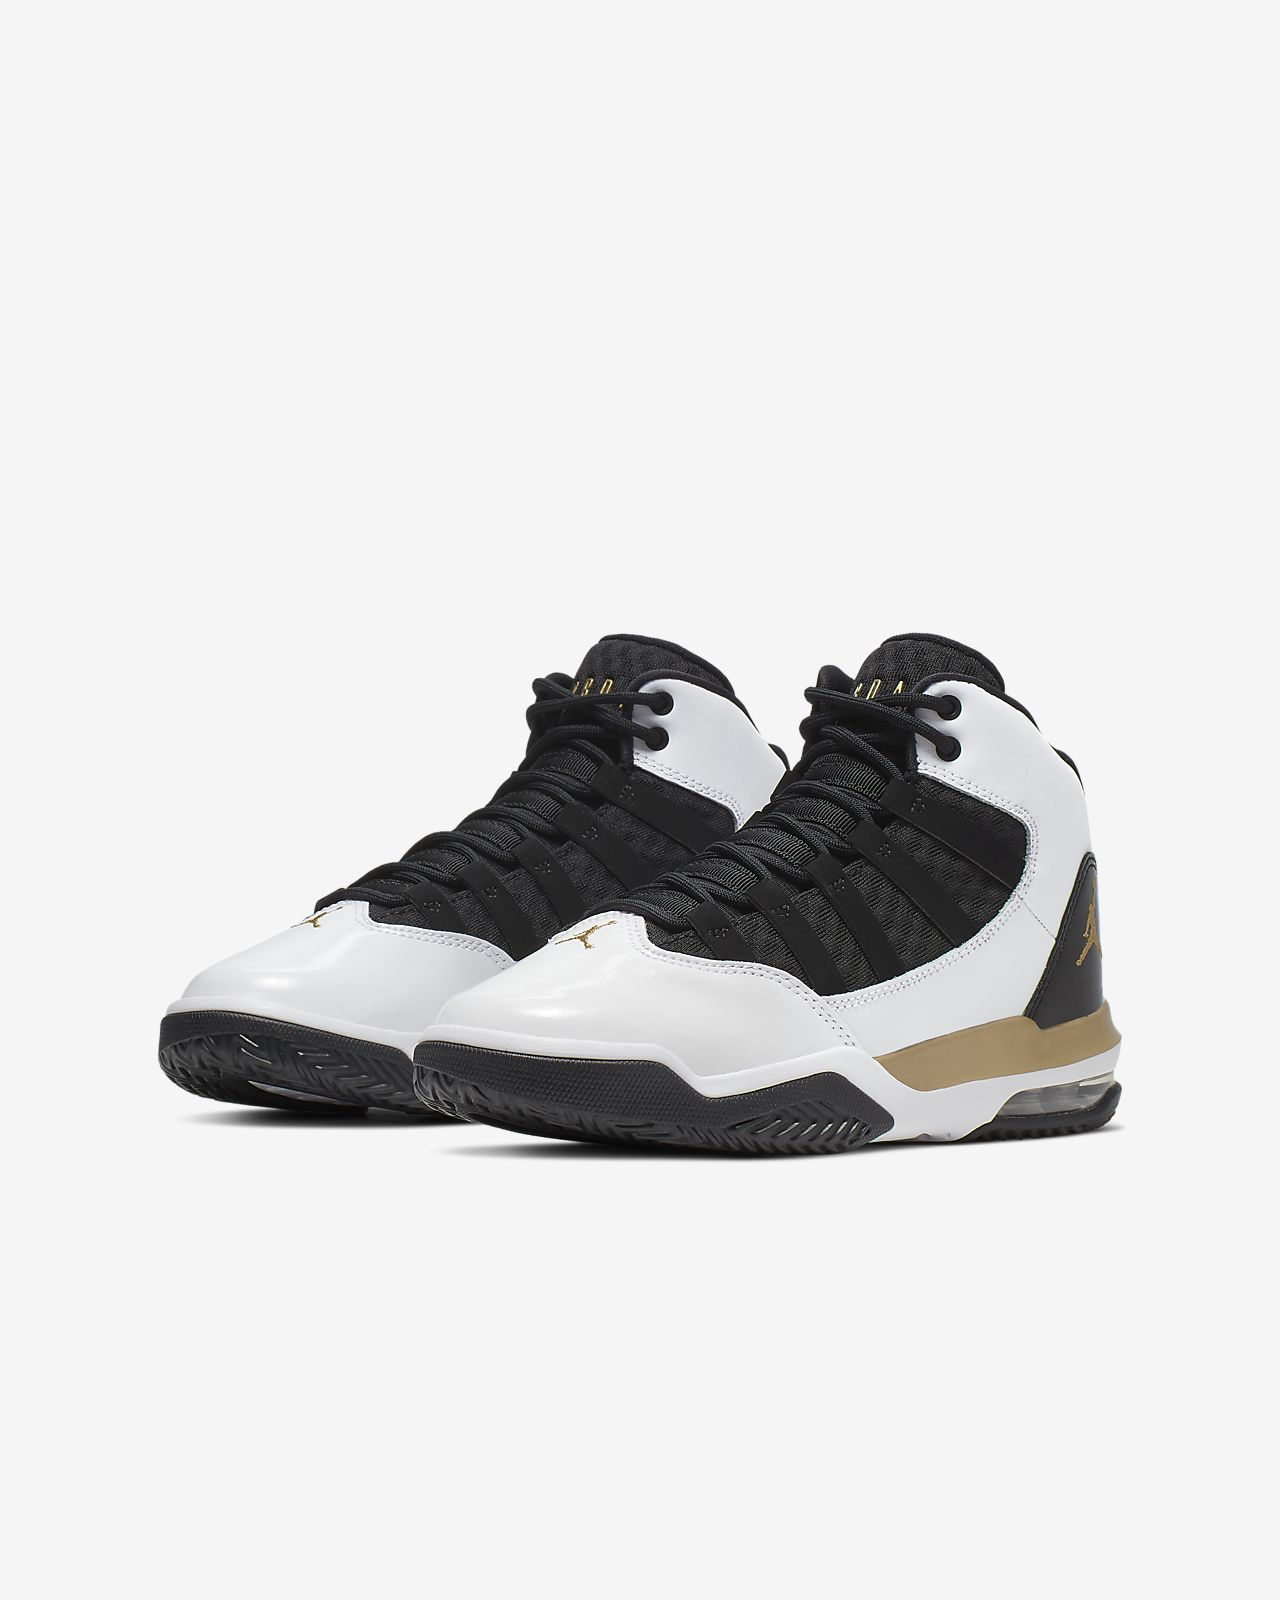 new concept 15b79 68216 Jordan Max Aura Older Kids' (Boys') Shoe